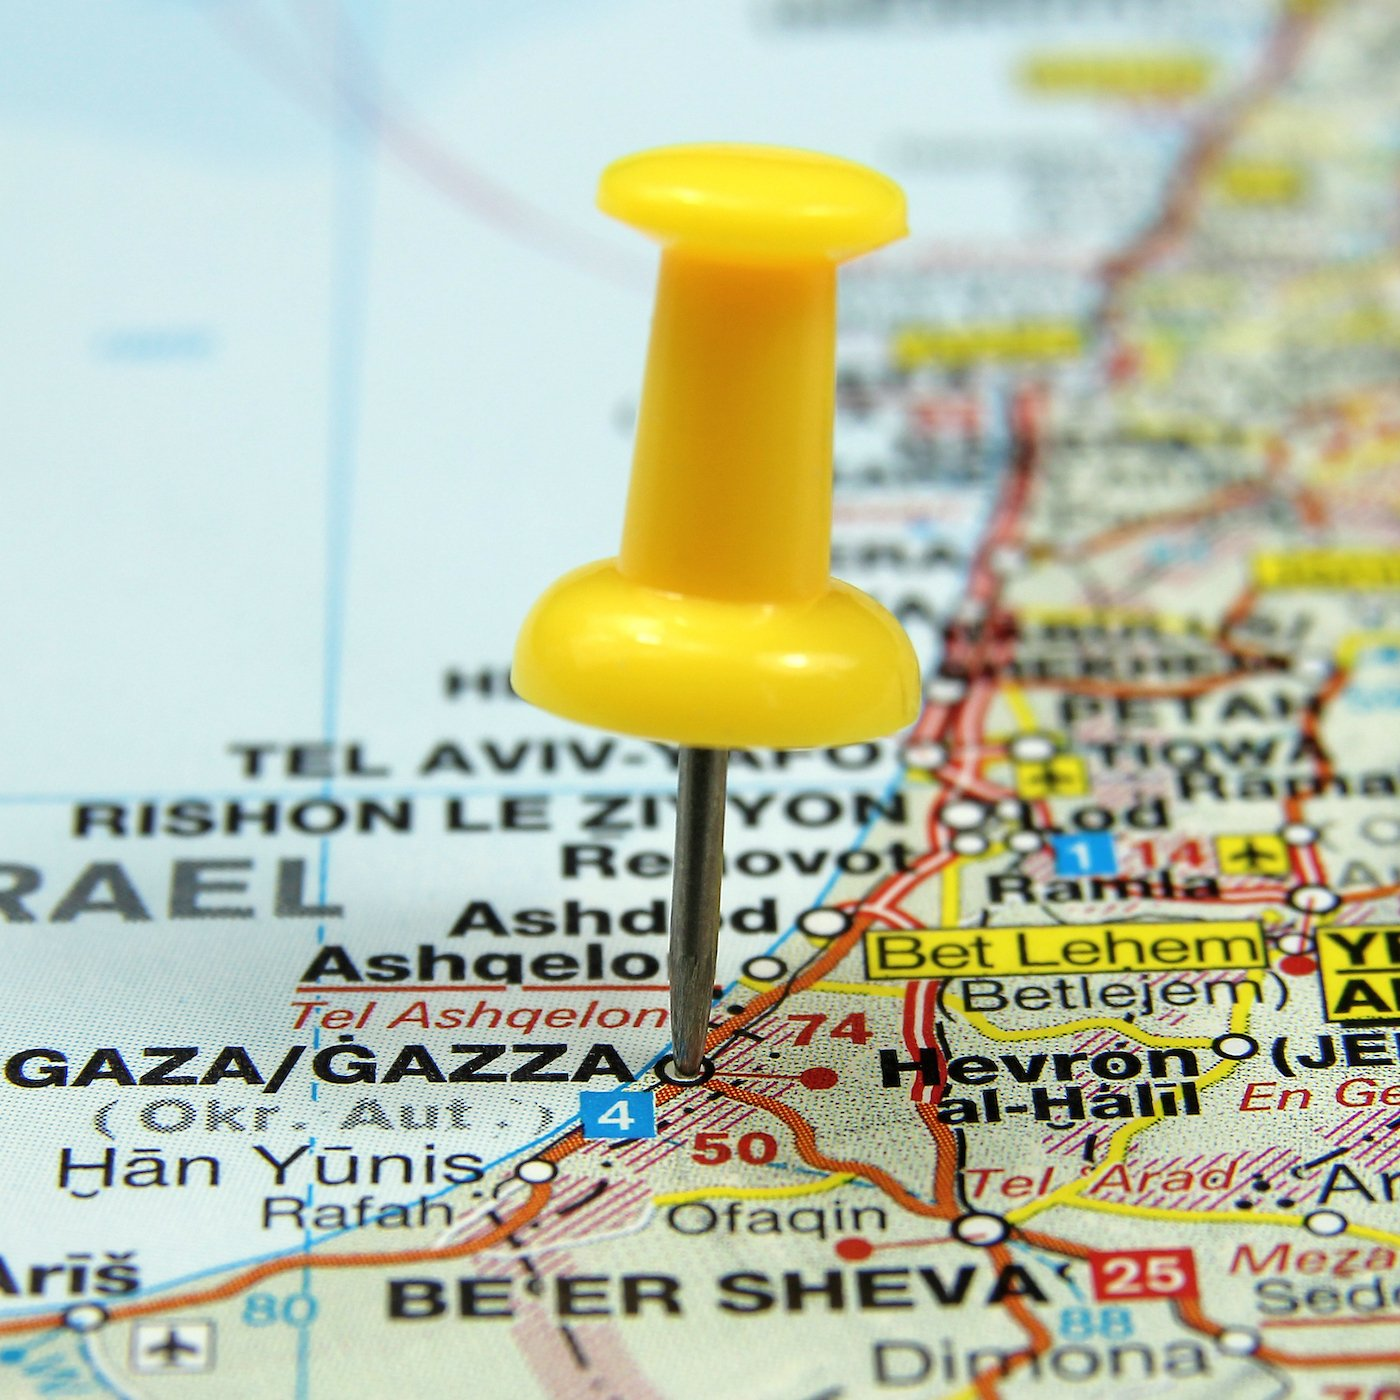 Listen: Israel-Gaza Conflict: Heavy Artillery Fire Escalates Violence